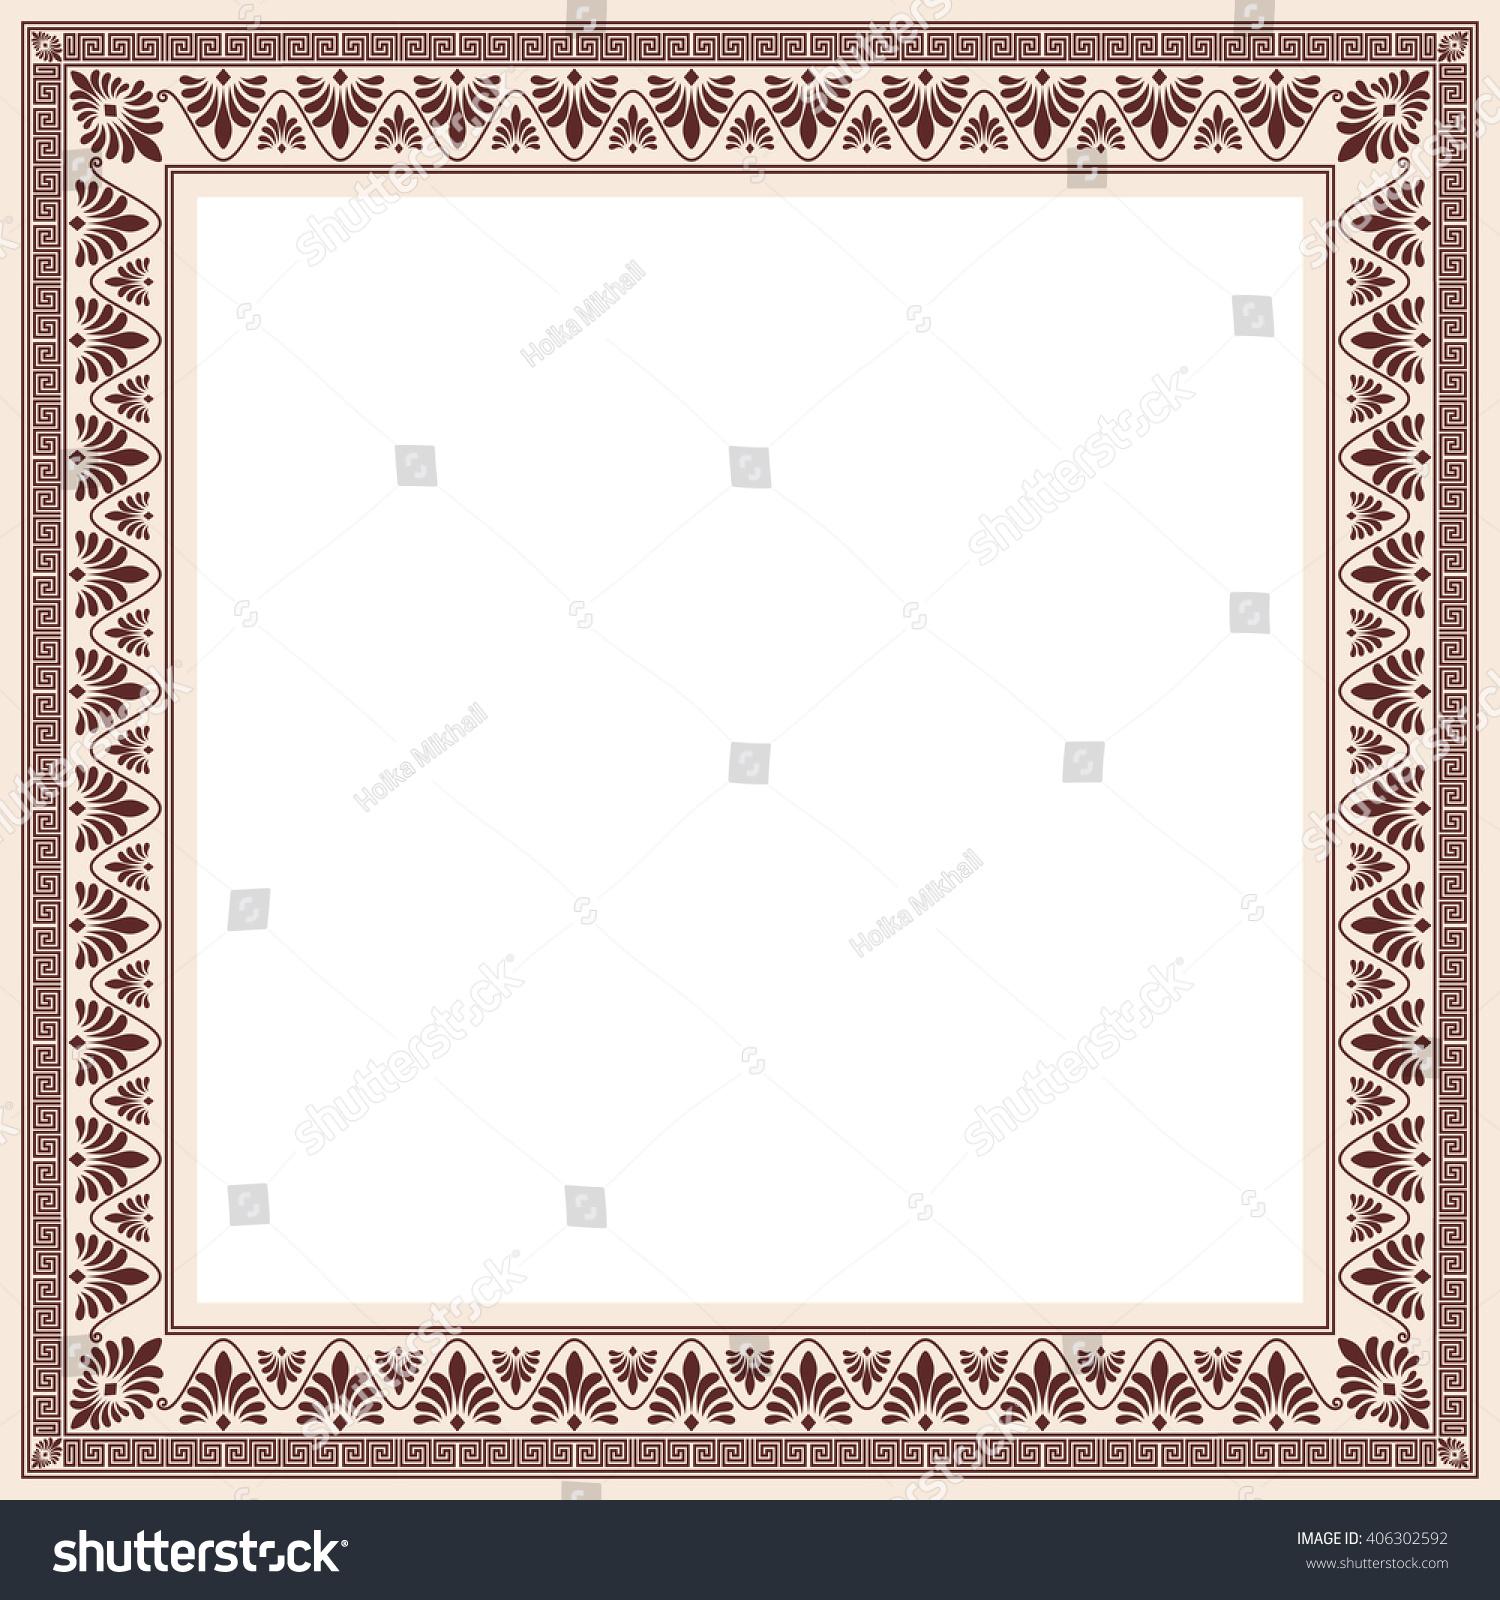 Greek style frame ornament brown pattern stock vector 406302592 greek style frame ornament brown pattern on a beige background jeuxipadfo Gallery